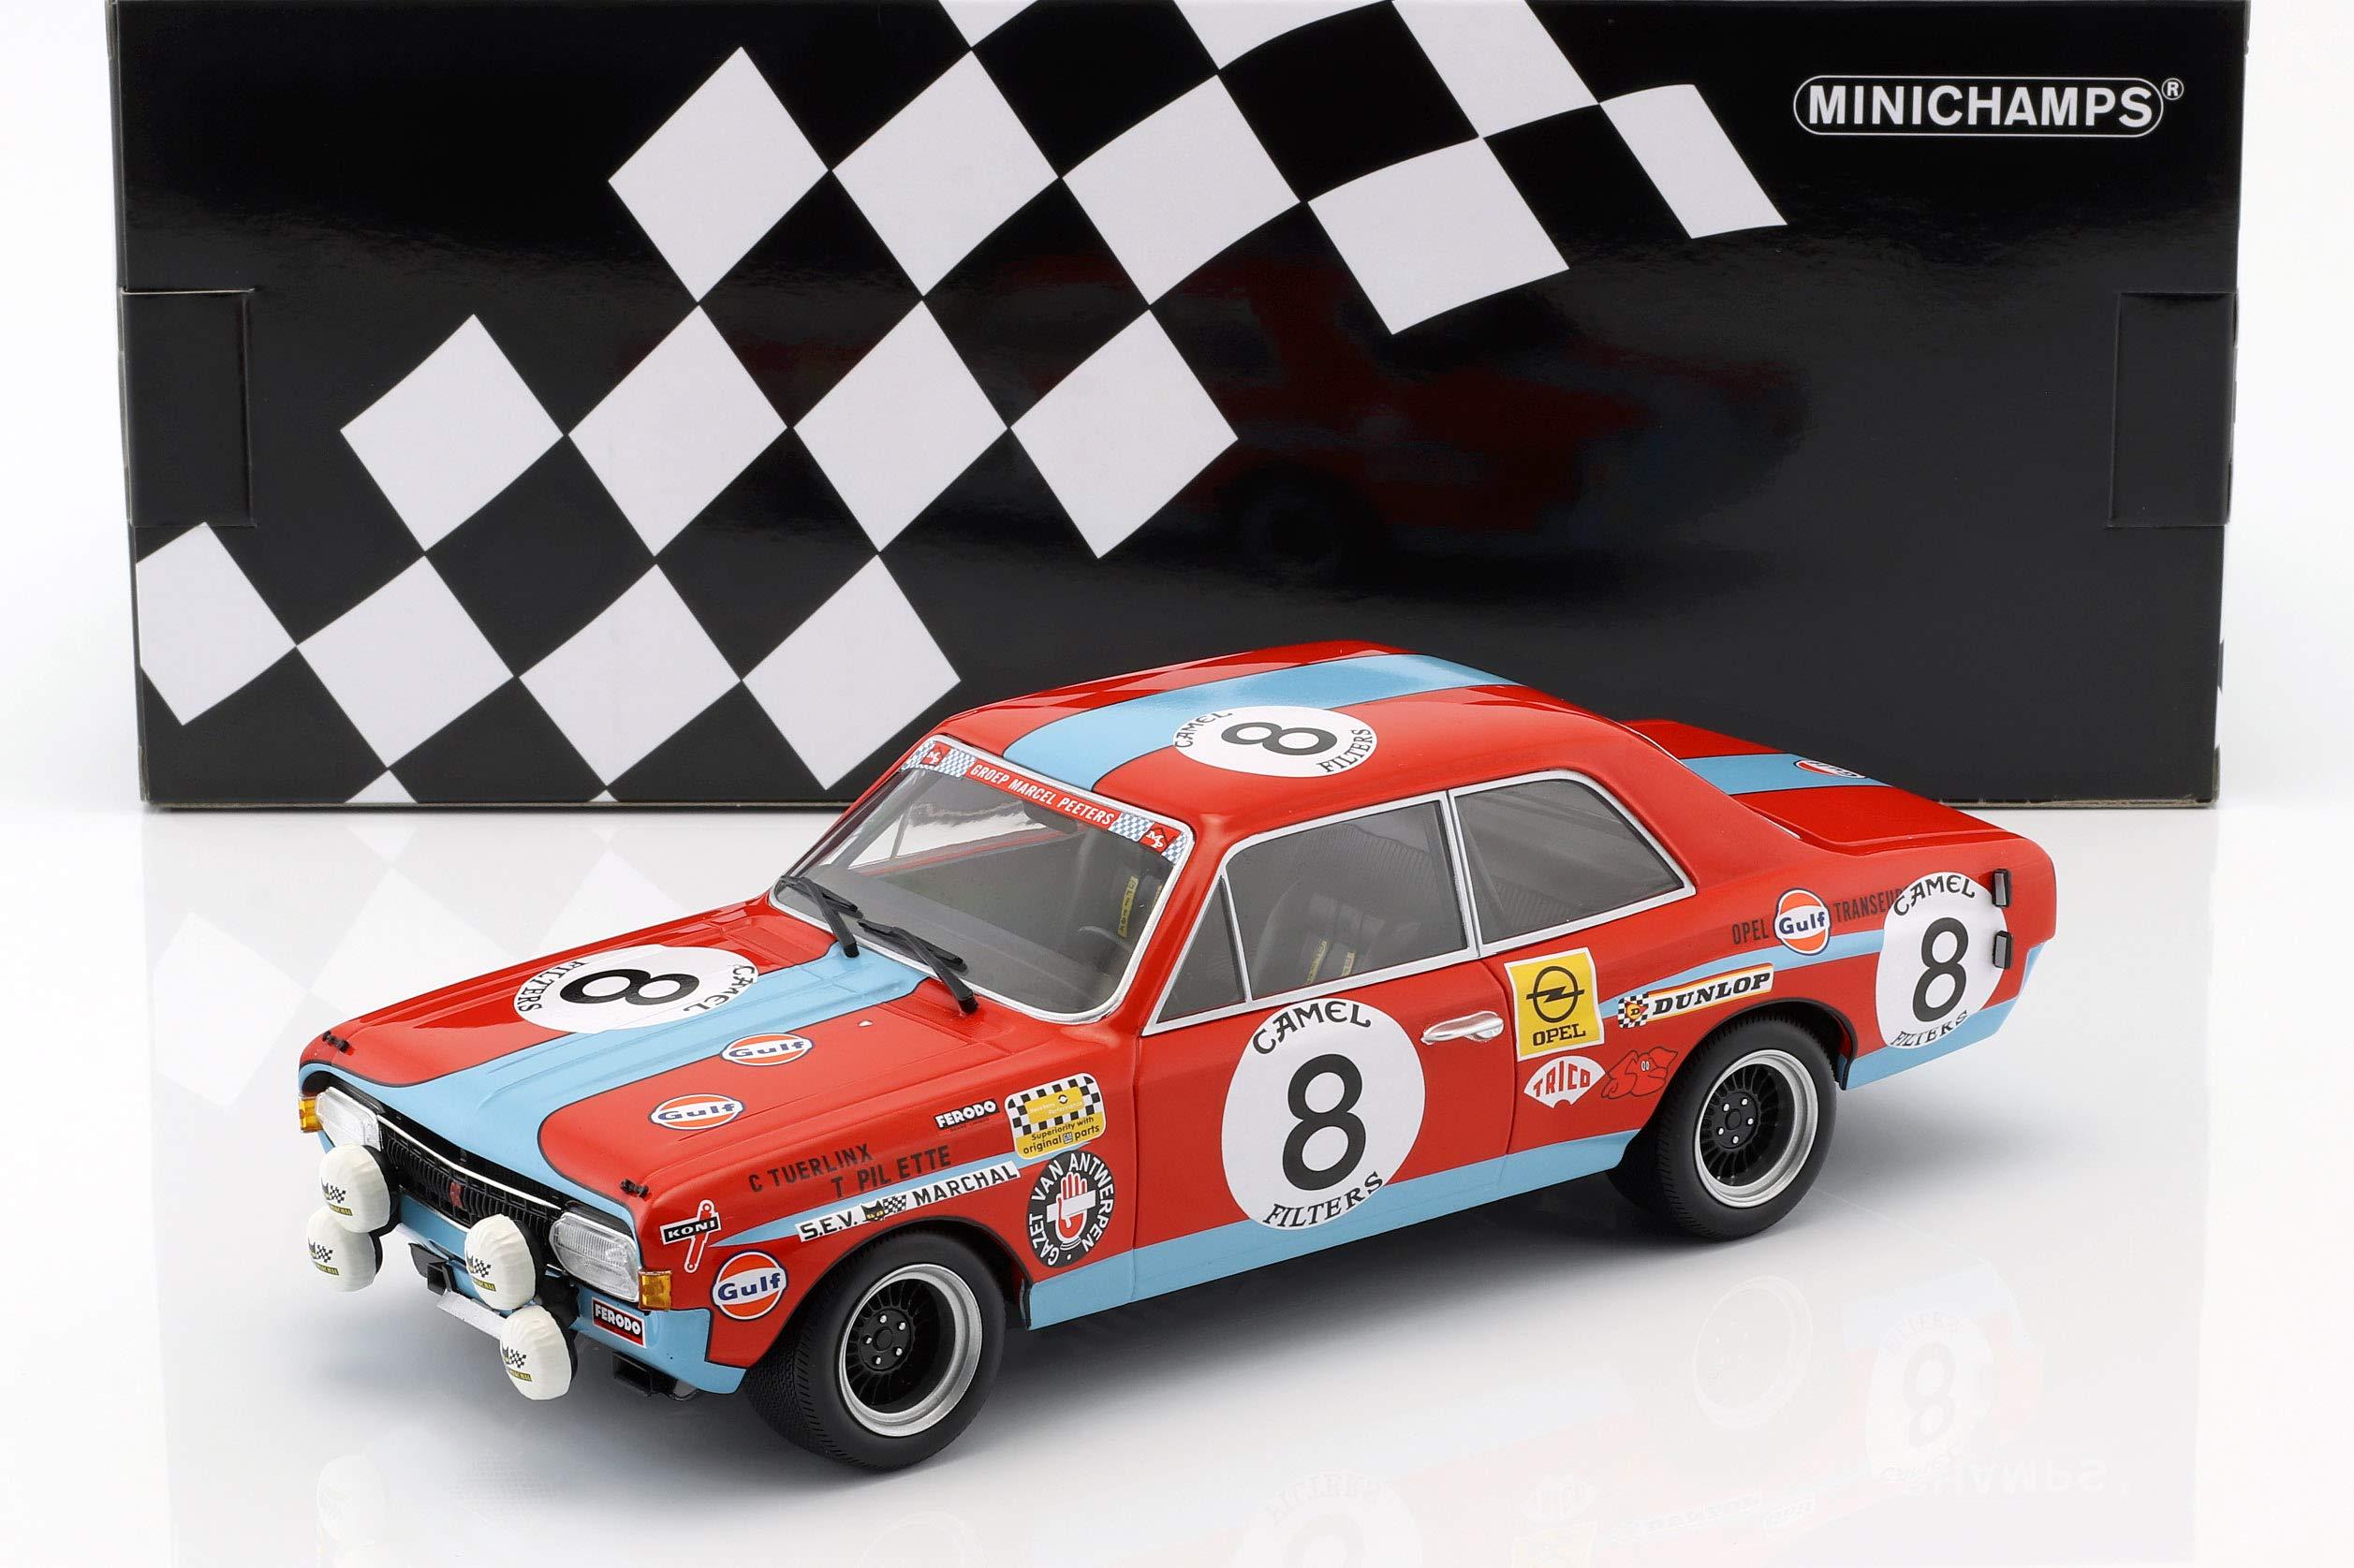 Minichamps 155724608 Collectible Miniature Car - Red/Blue